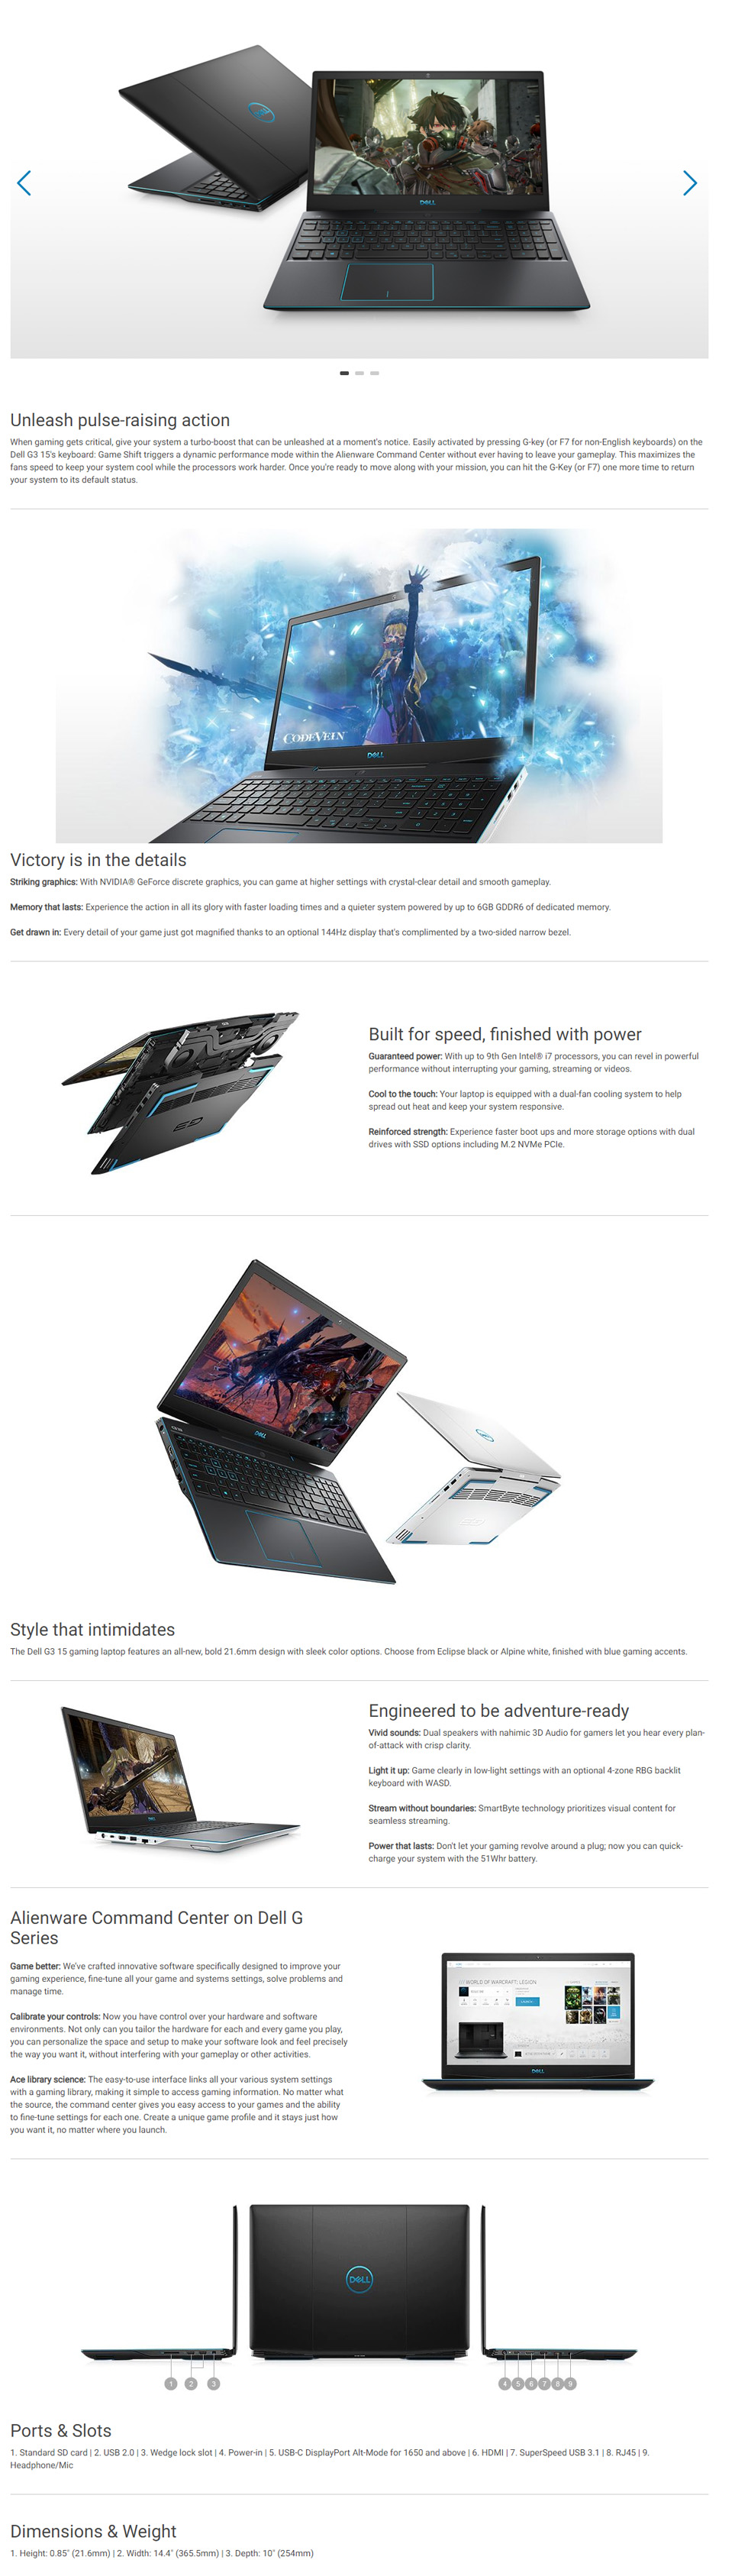 Dell Inspiron G3 15 G3-97114G1650-SSD 15 6